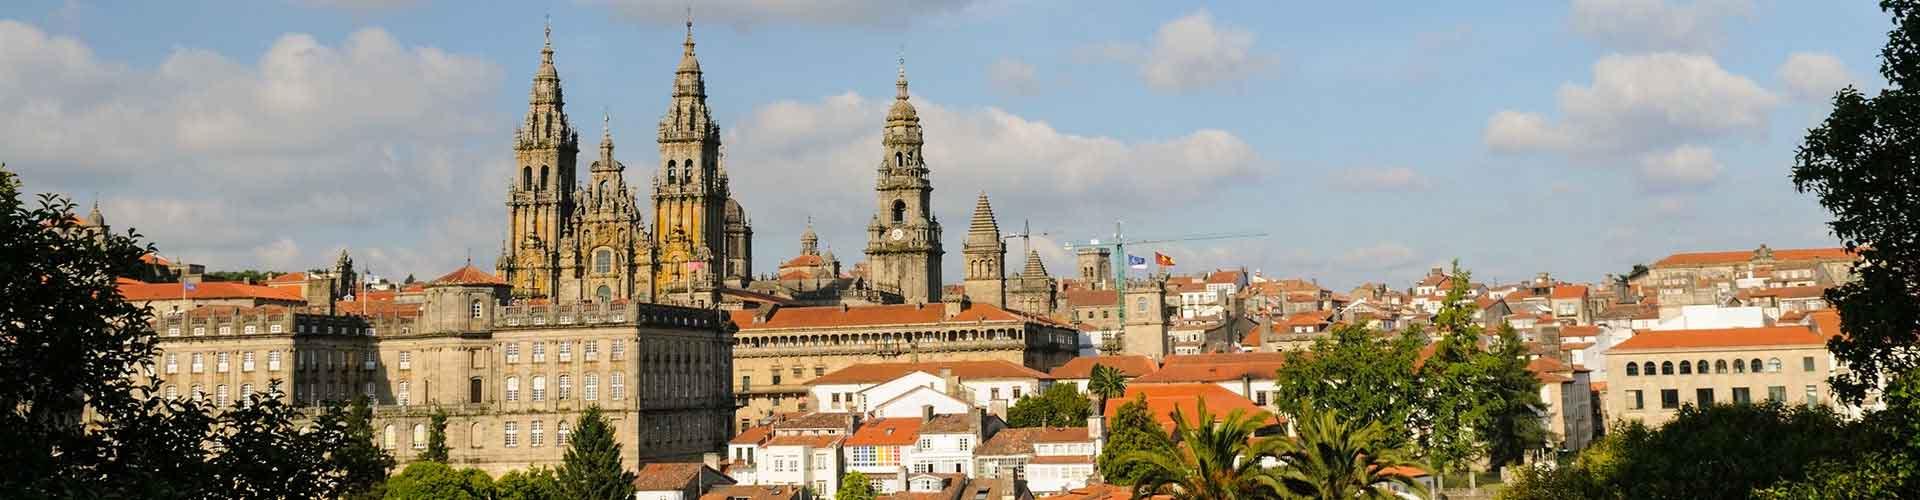 Santiago de Compostela – Hostels in Santiago de Compostela. Santiago de Compostela auf der Karte. Fotos und Bewertungen für jedes Hostel in Santiago de Compostela.